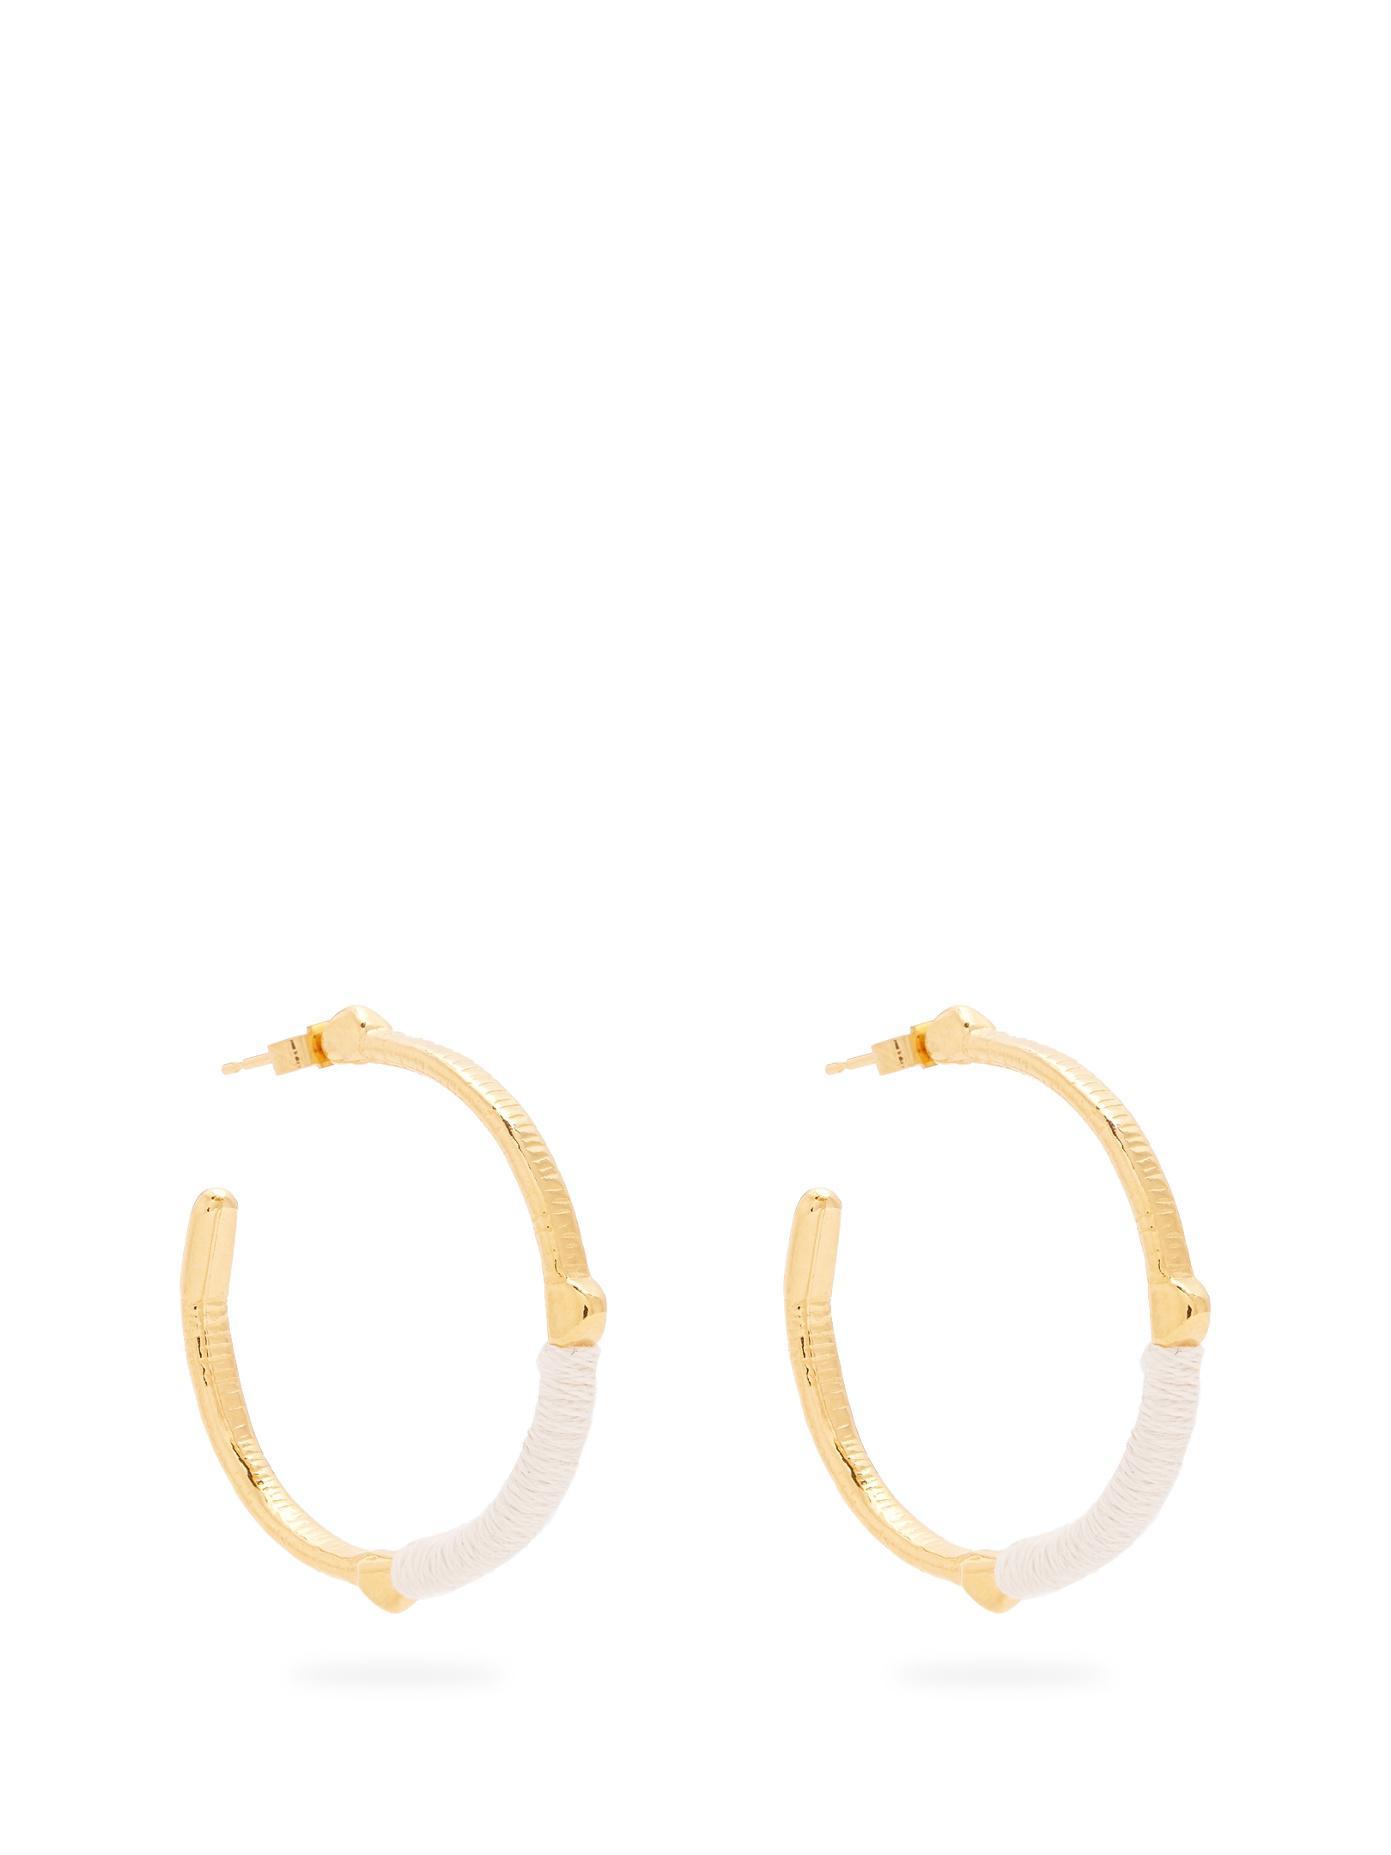 Freya gold-plated single earring Marte Frisnes kPMy76Nx